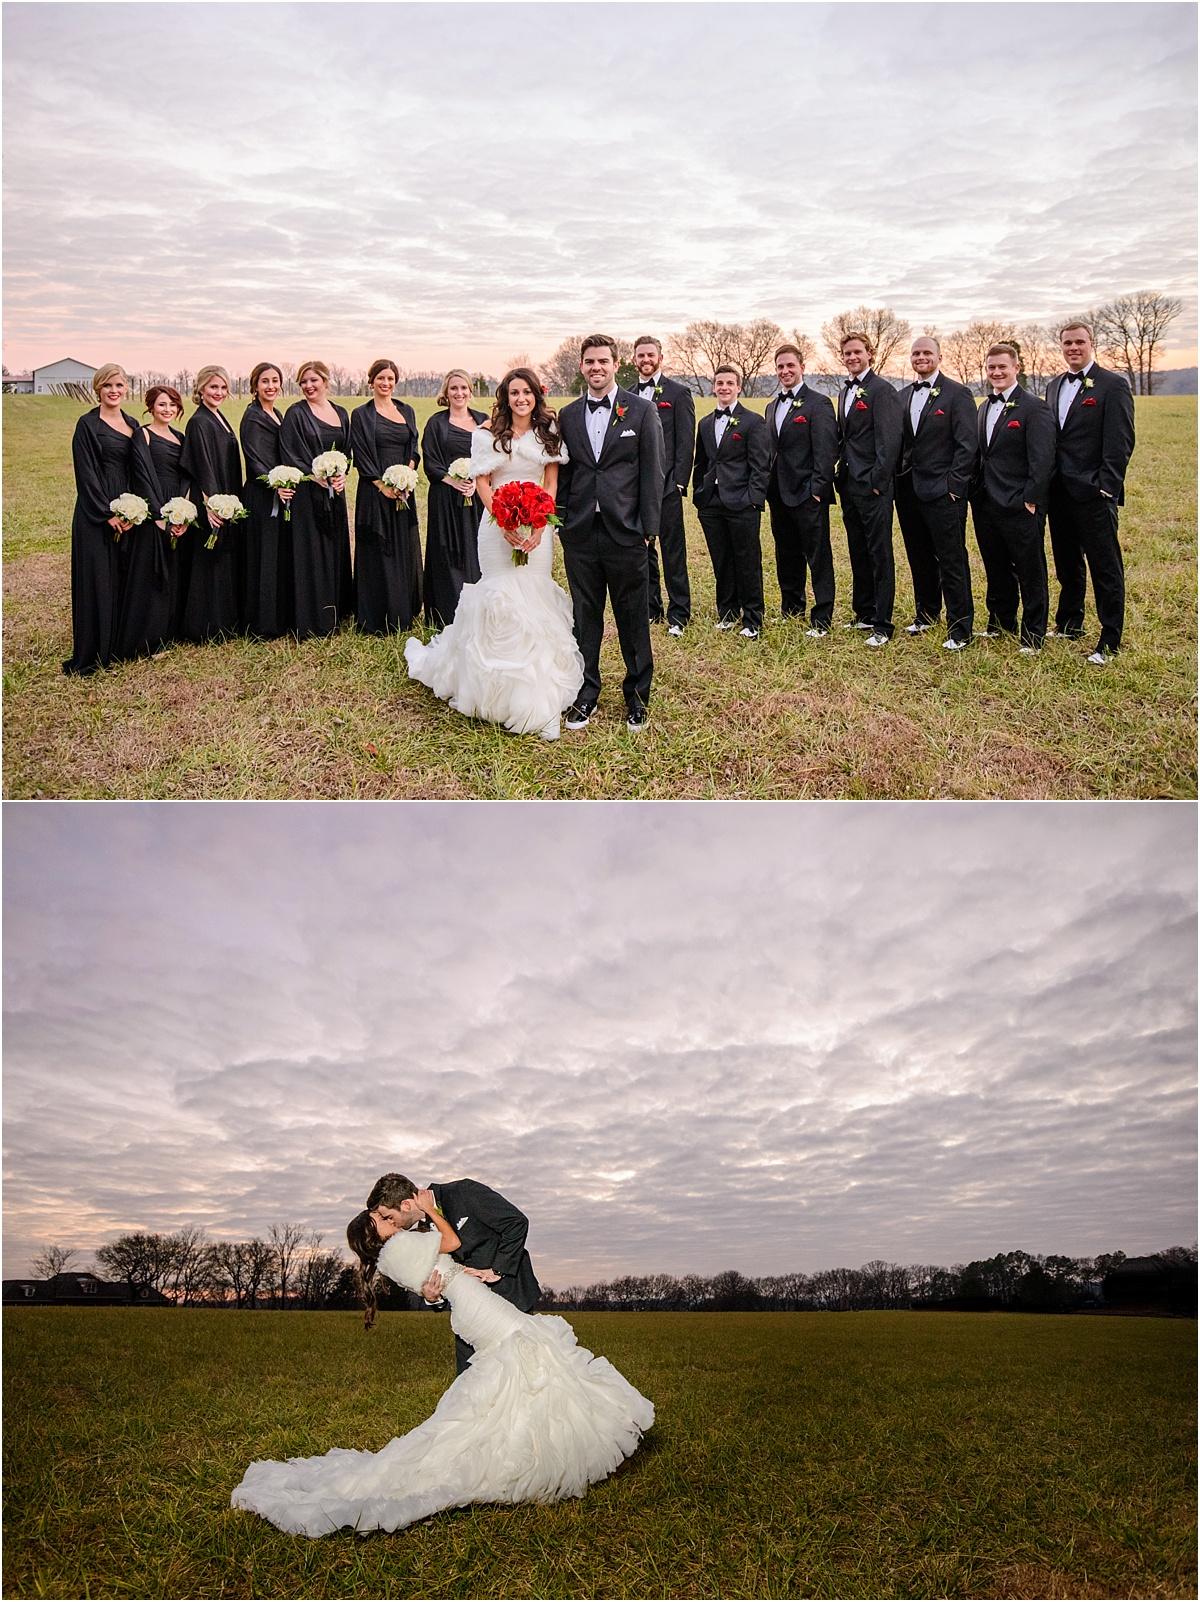 Greg Smit Photography Nashville wedding photographer Mint Springs Farm_0021